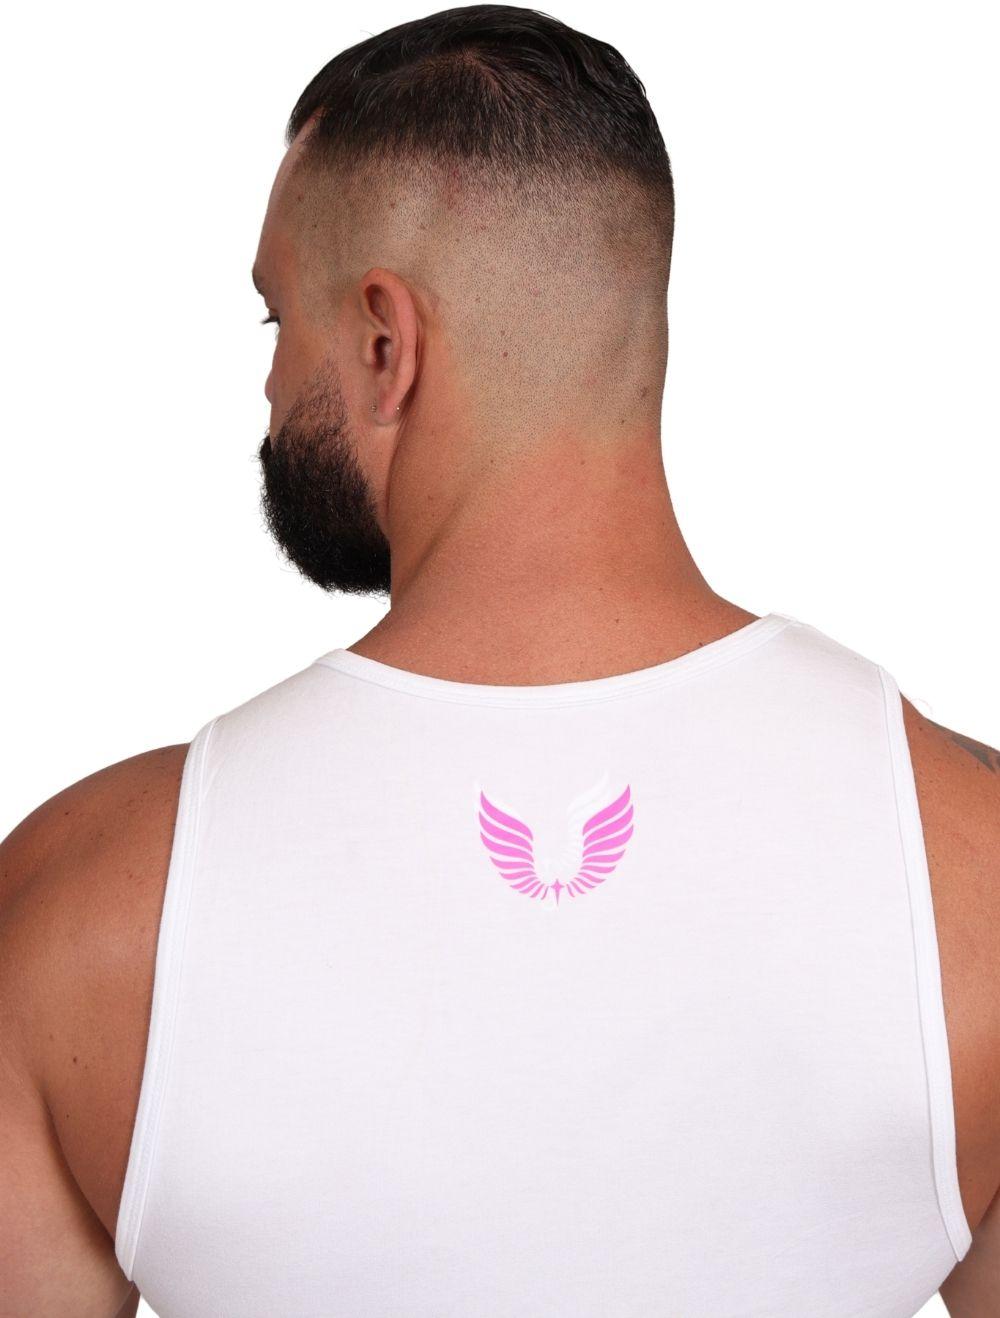 Regata Masculina Slim com Elastano Branco Estampa Neon Rosa